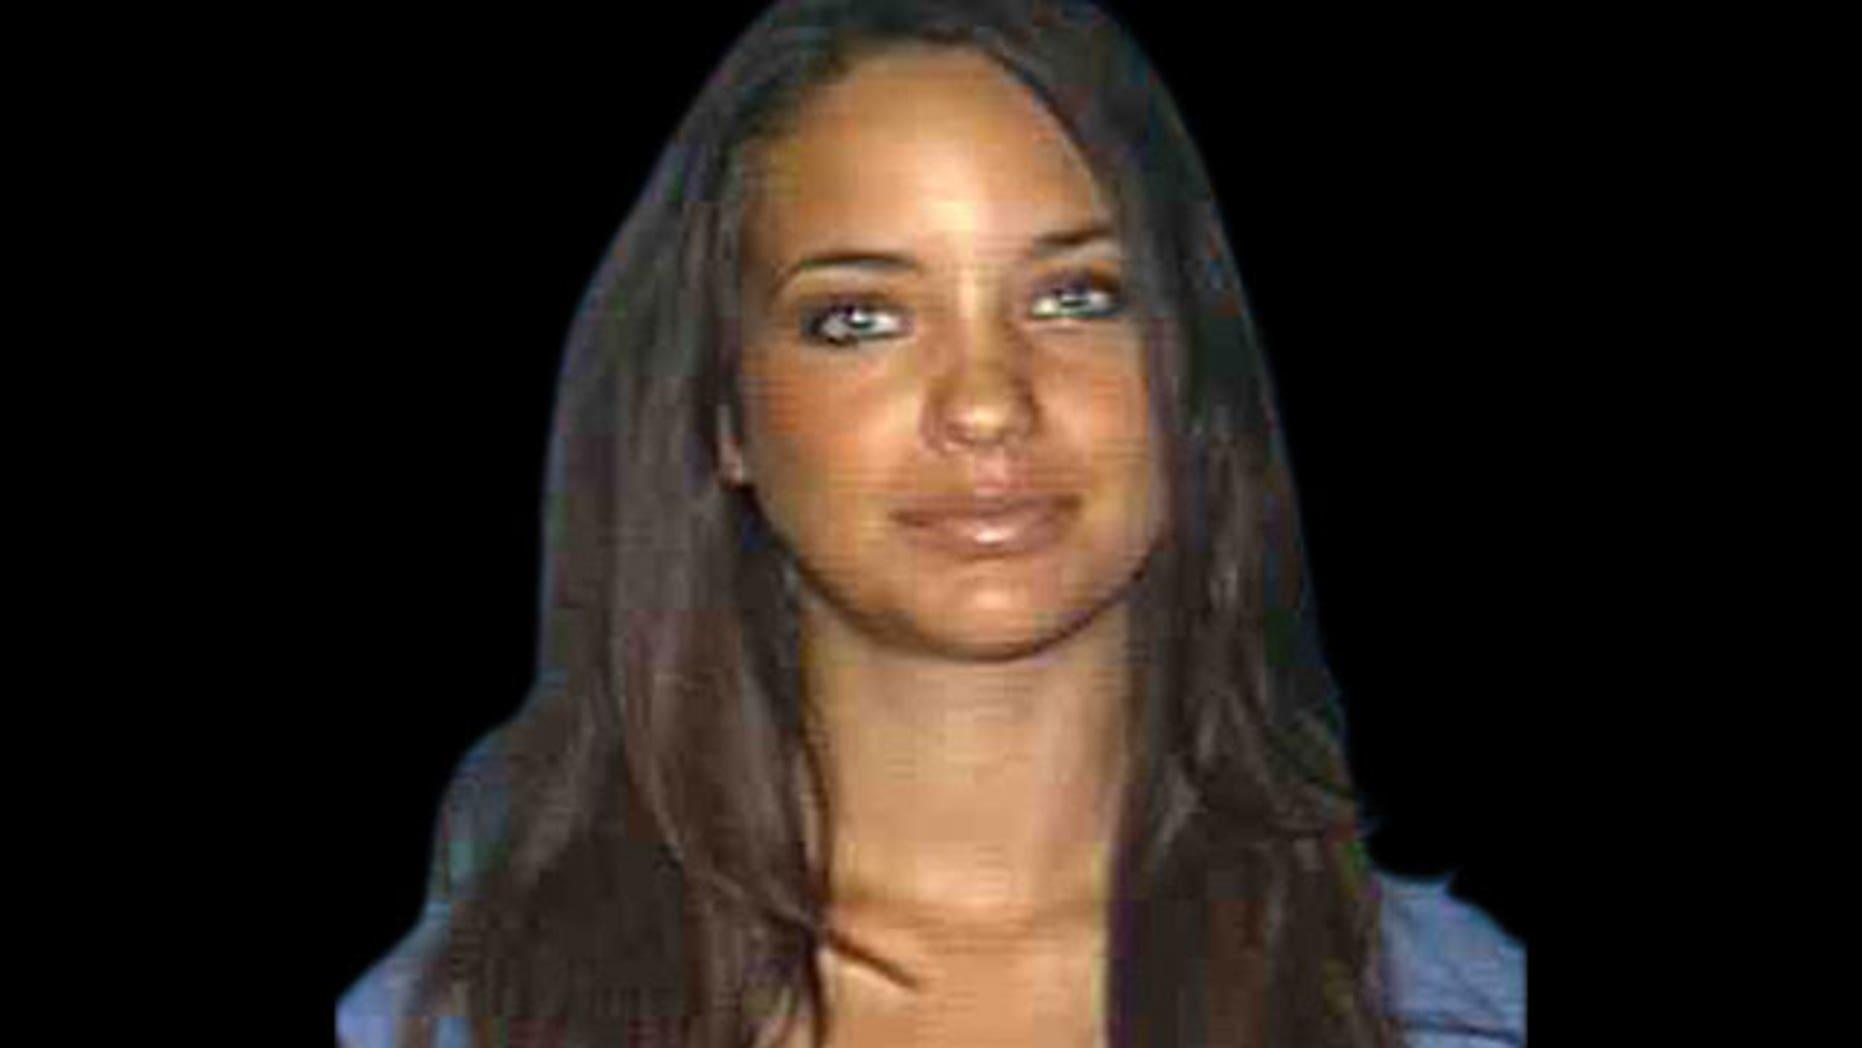 File: Juliana Redding, who was found dead in her apartment in Santa Monica, Calif.